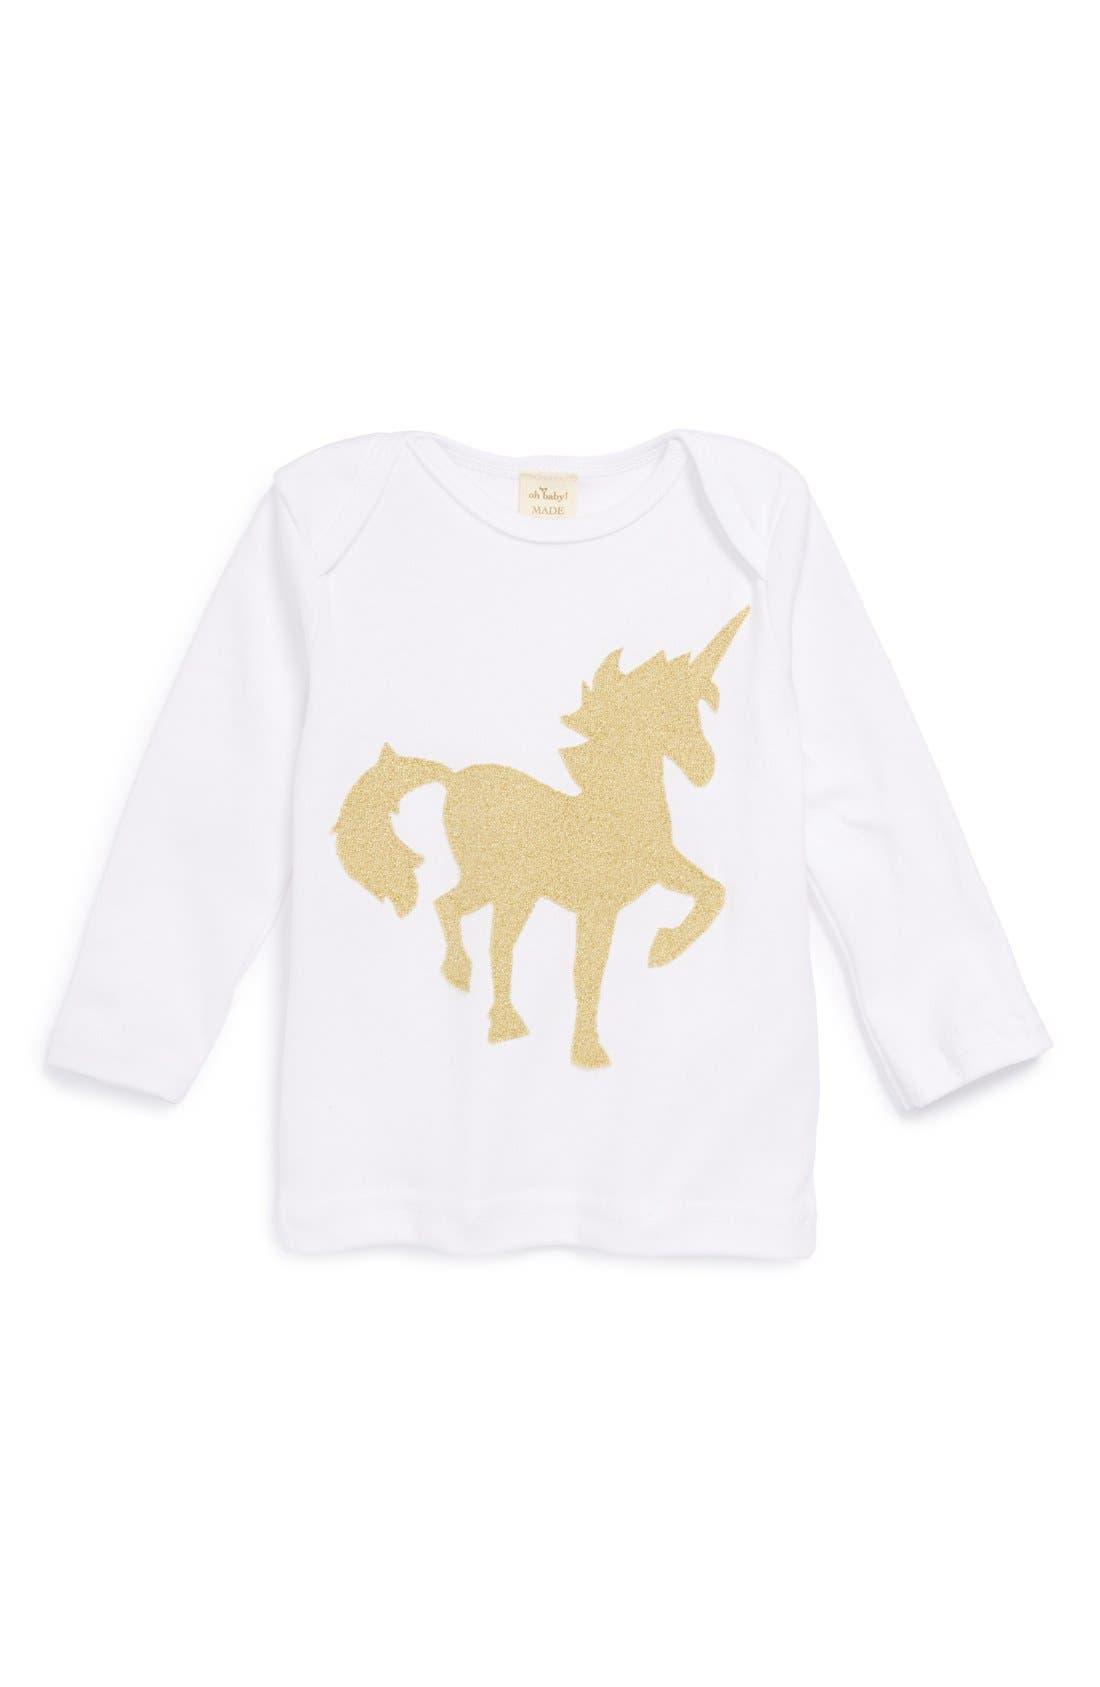 ! 'Gold Unicorn' Long Sleeve Cotton Top, Main, color, 100